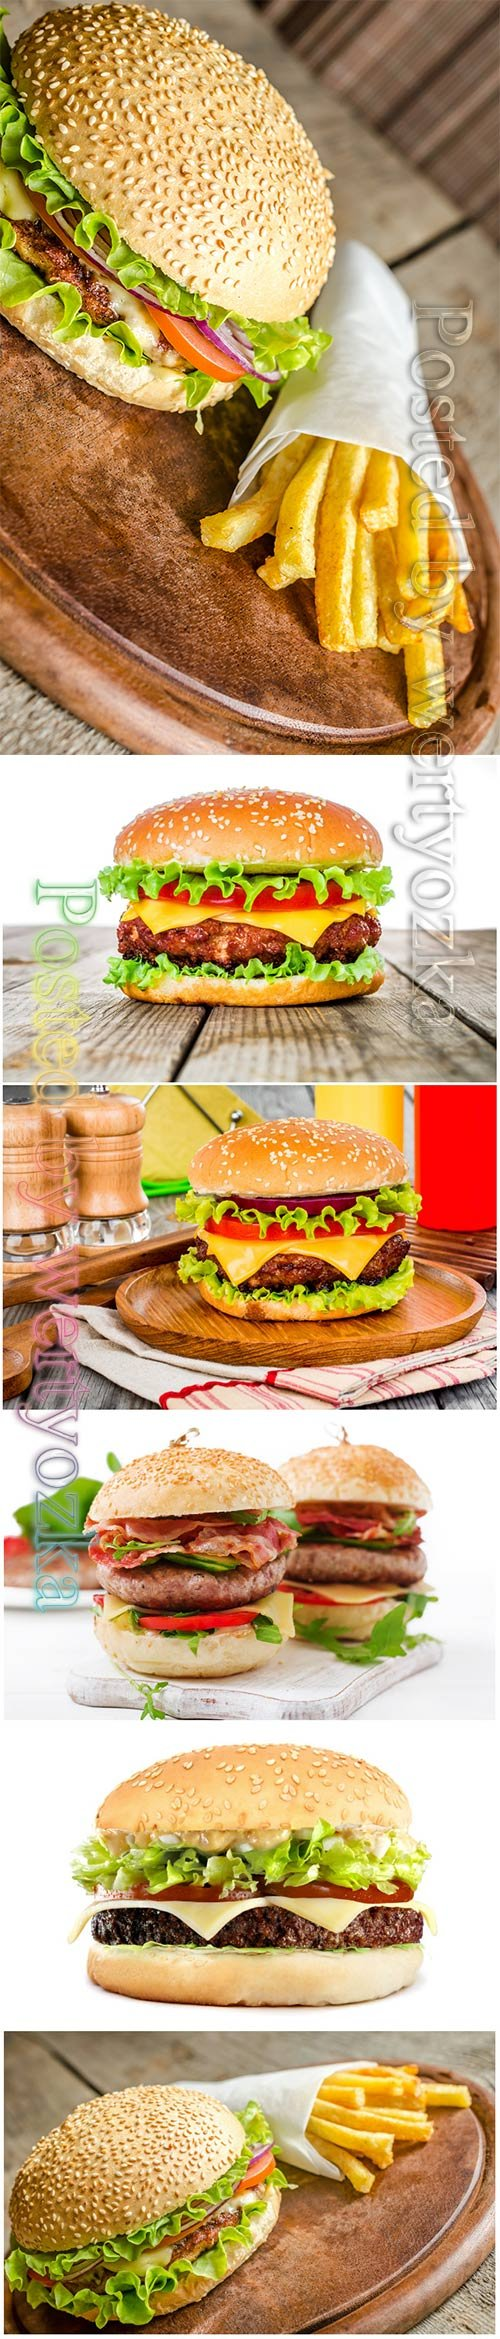 Cheeseburger, hamburger beautiful stock photo